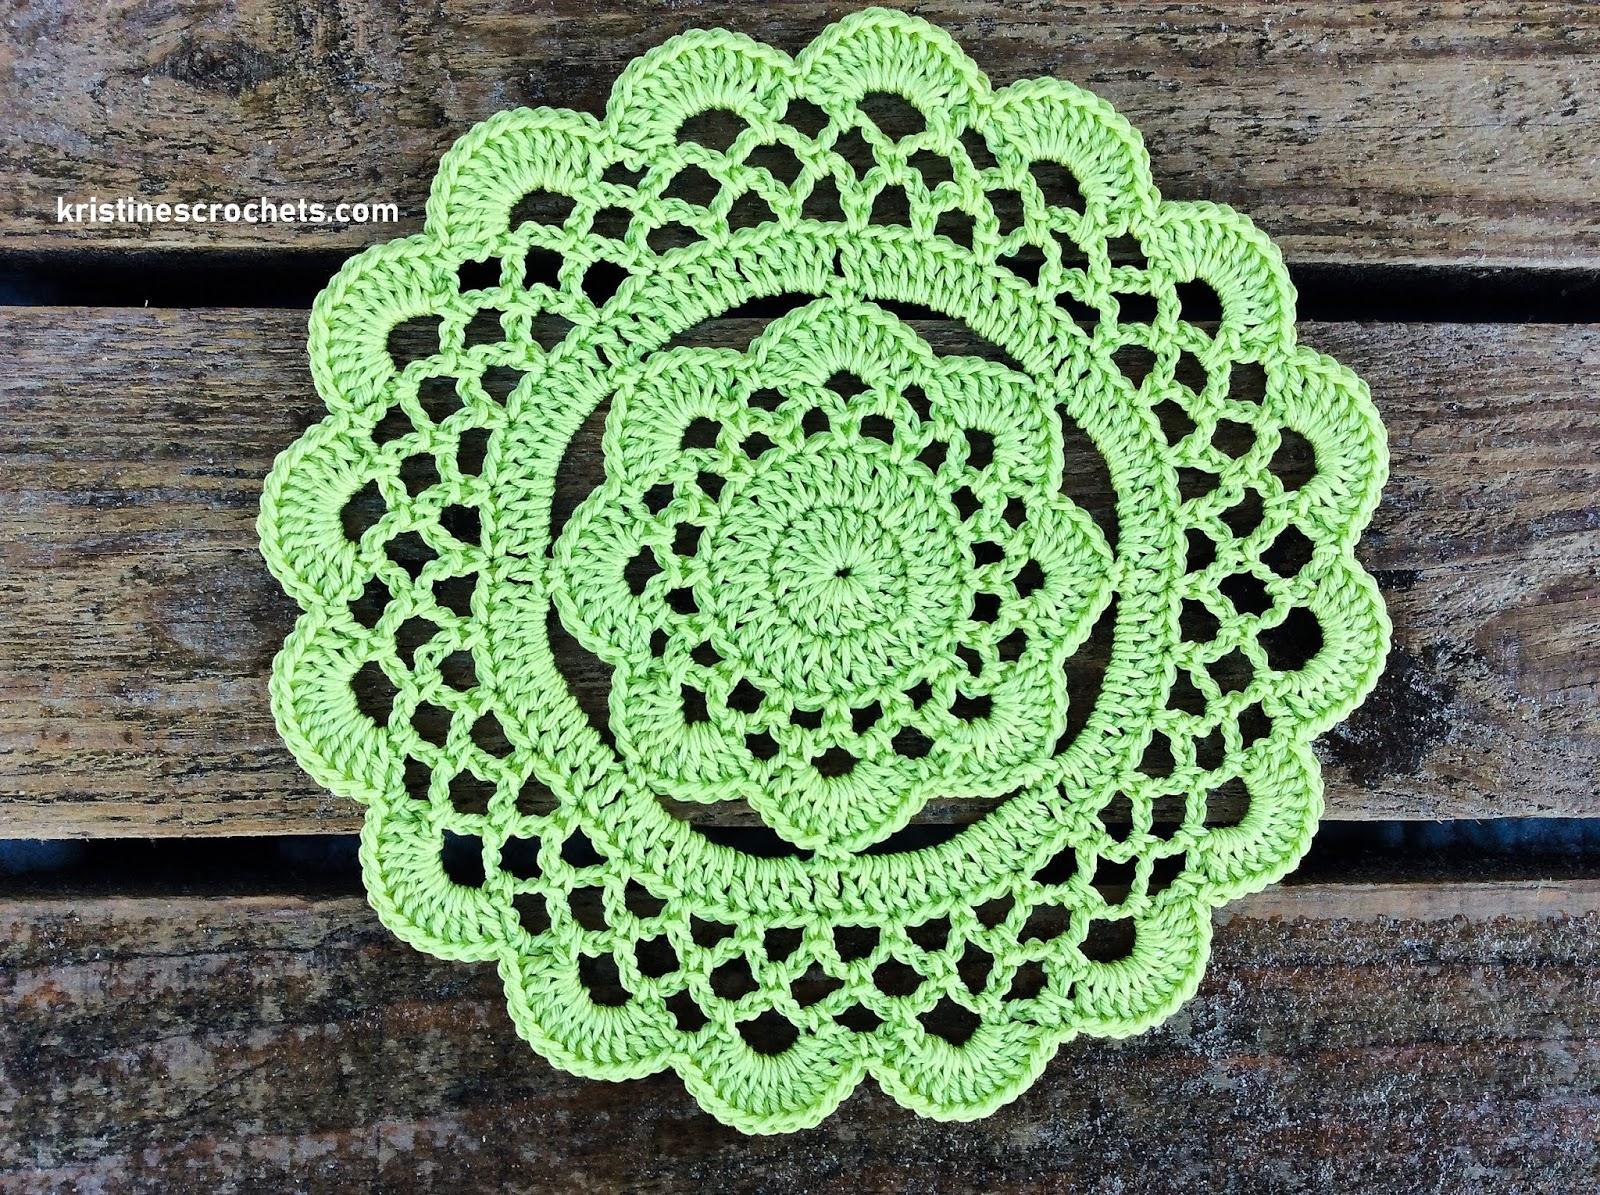 Kristinescrochets Easy Floral Doily Free Crochet Pattern